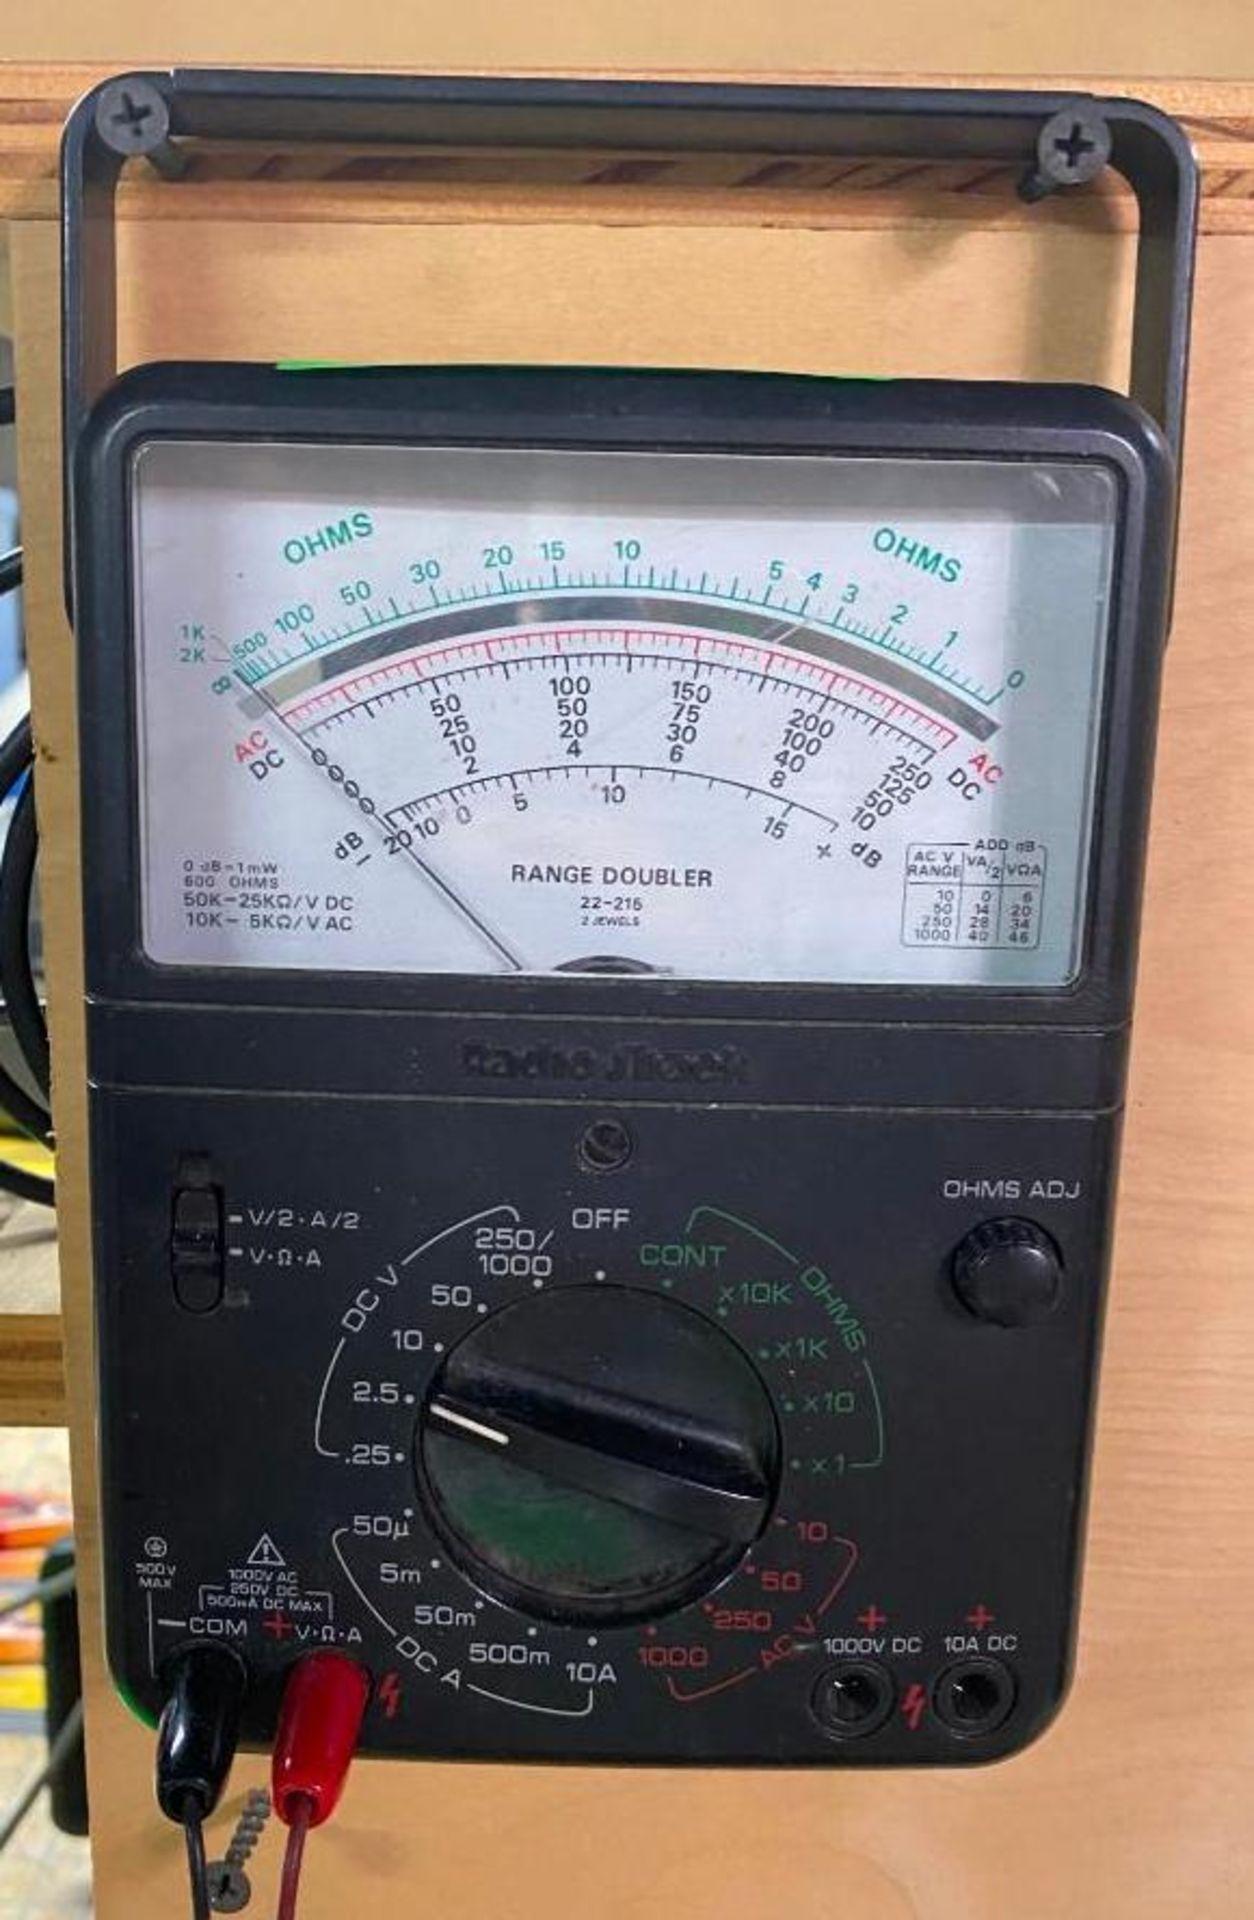 Lot 159 - DESCRIPTION RANGE DOUBLER BRAND/MODEL RADIO SHACK LOCATION BASEMENT QUANTITY: X BID 1